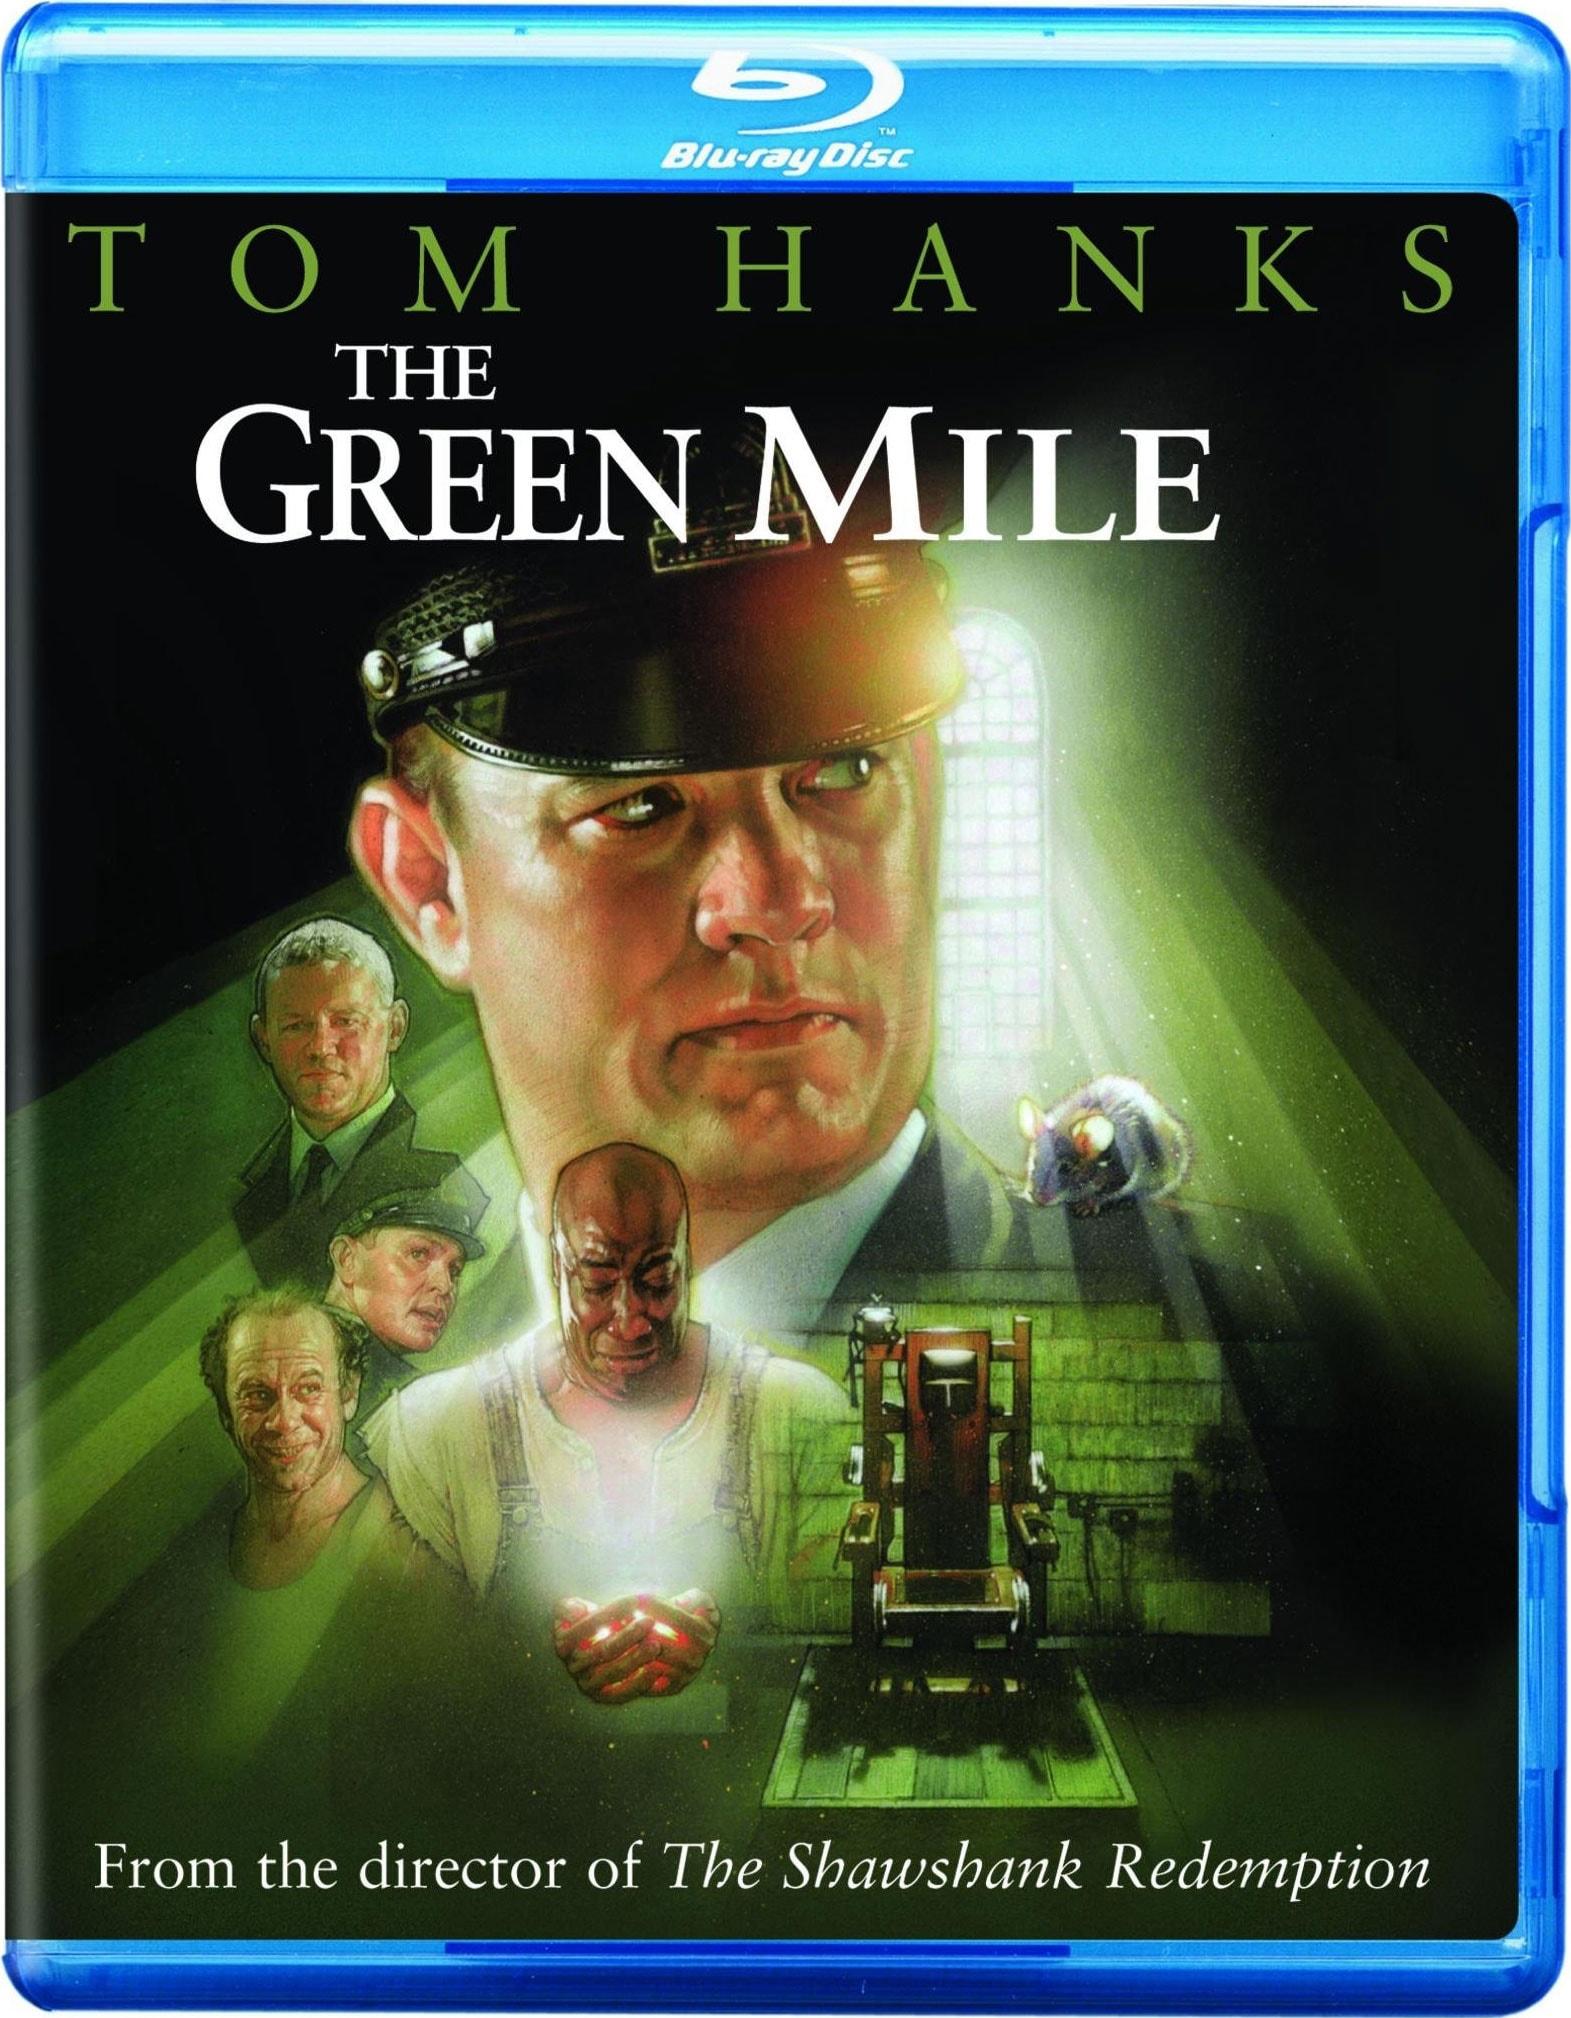 The Green Mile (Blu-ray Disc)